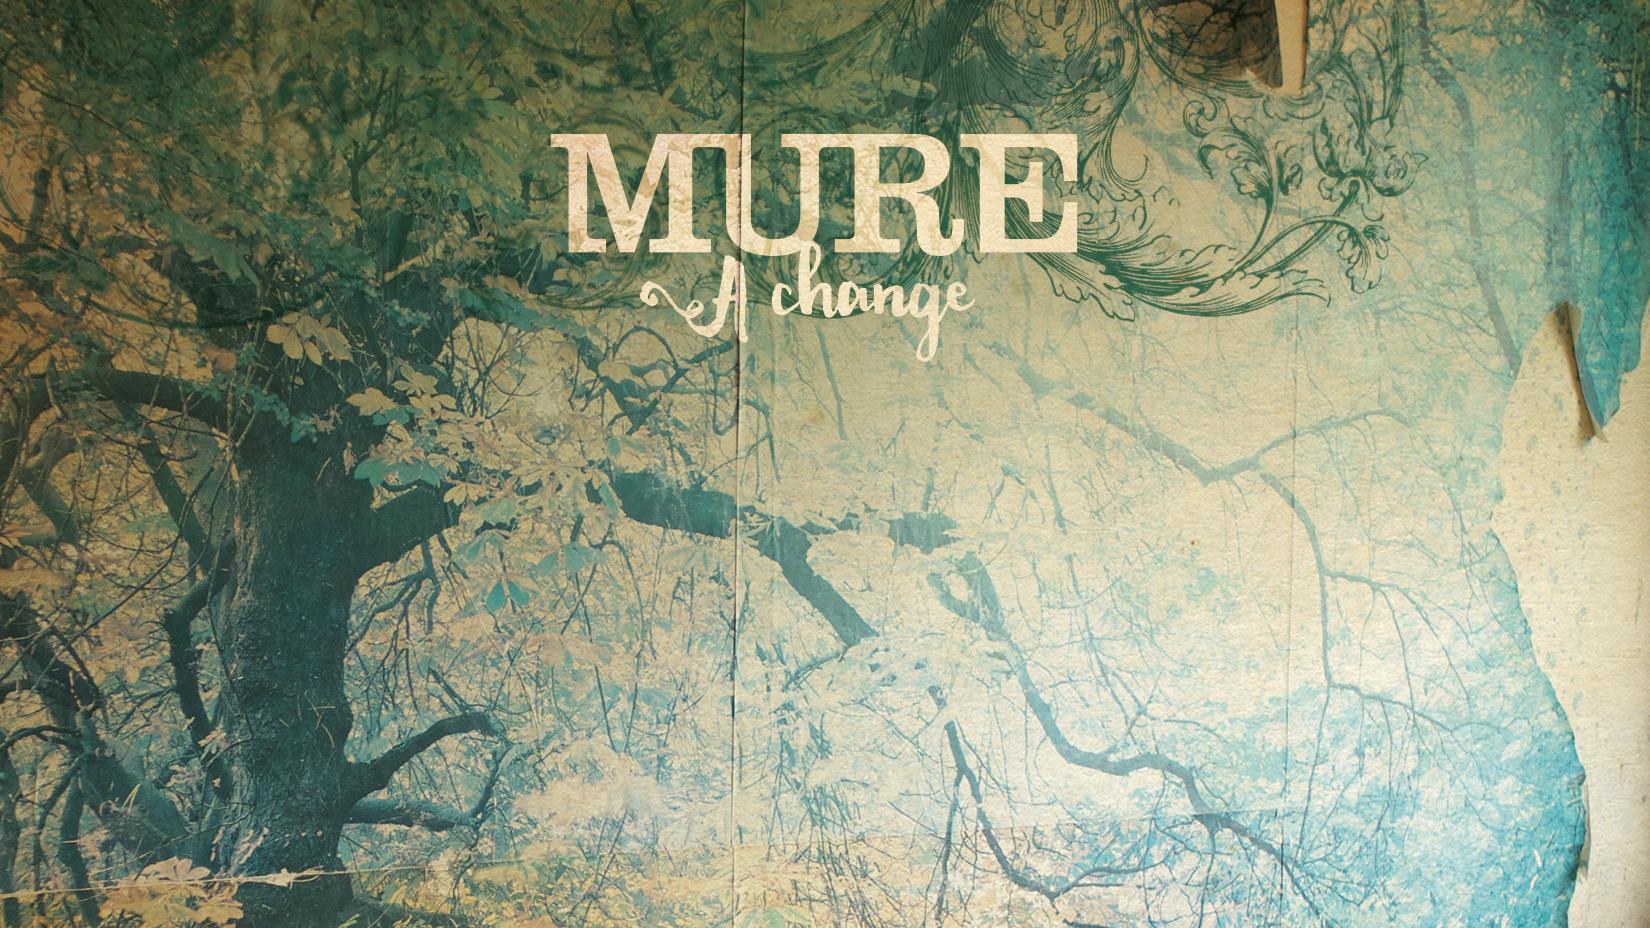 MURE-a_change-couv_digipack-1516734549.jpg